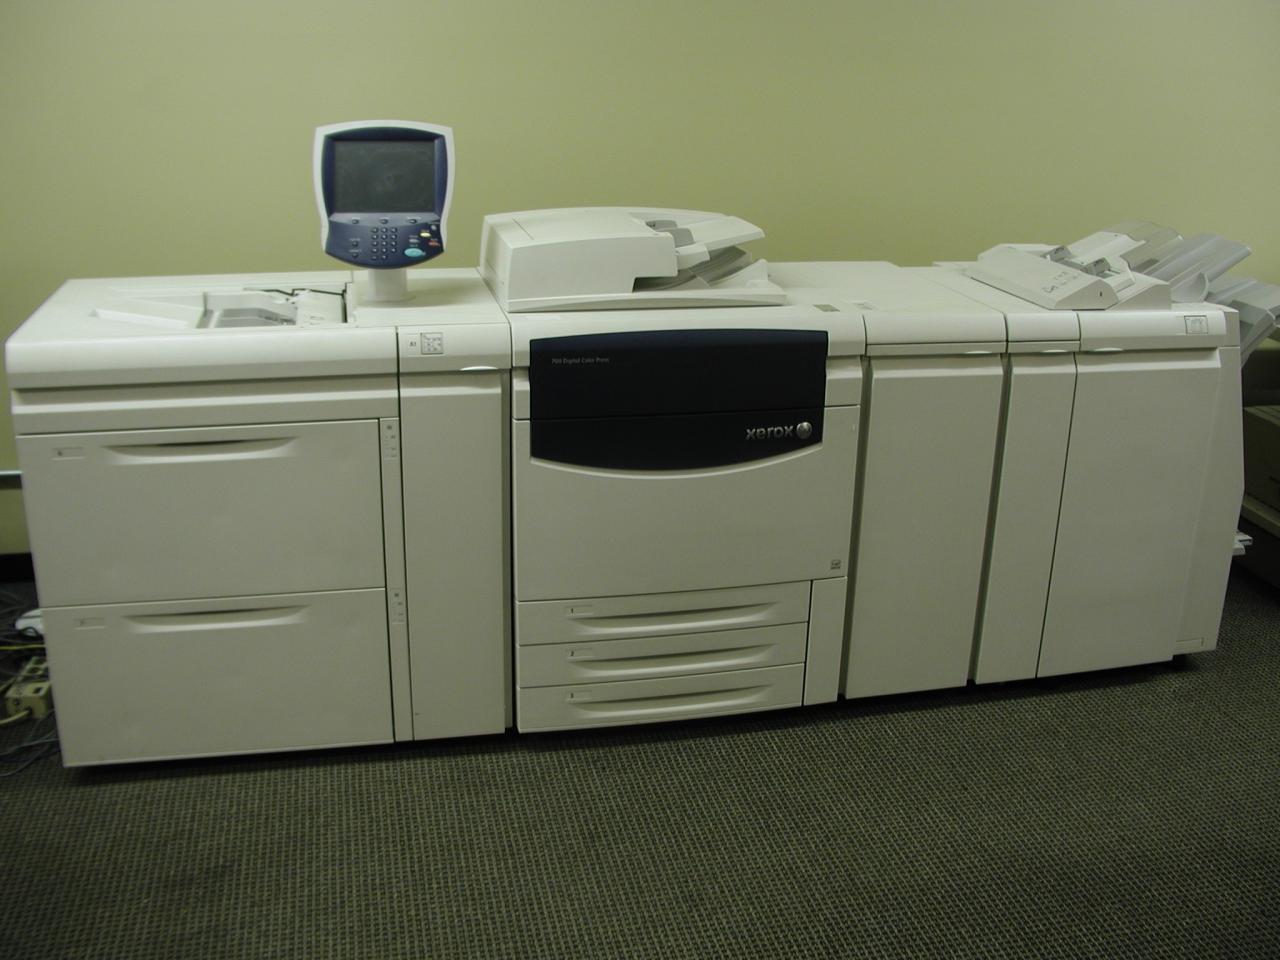 Color press printing -  Xerox 700 Digital Color Press Cx Creo Print Server 2 High